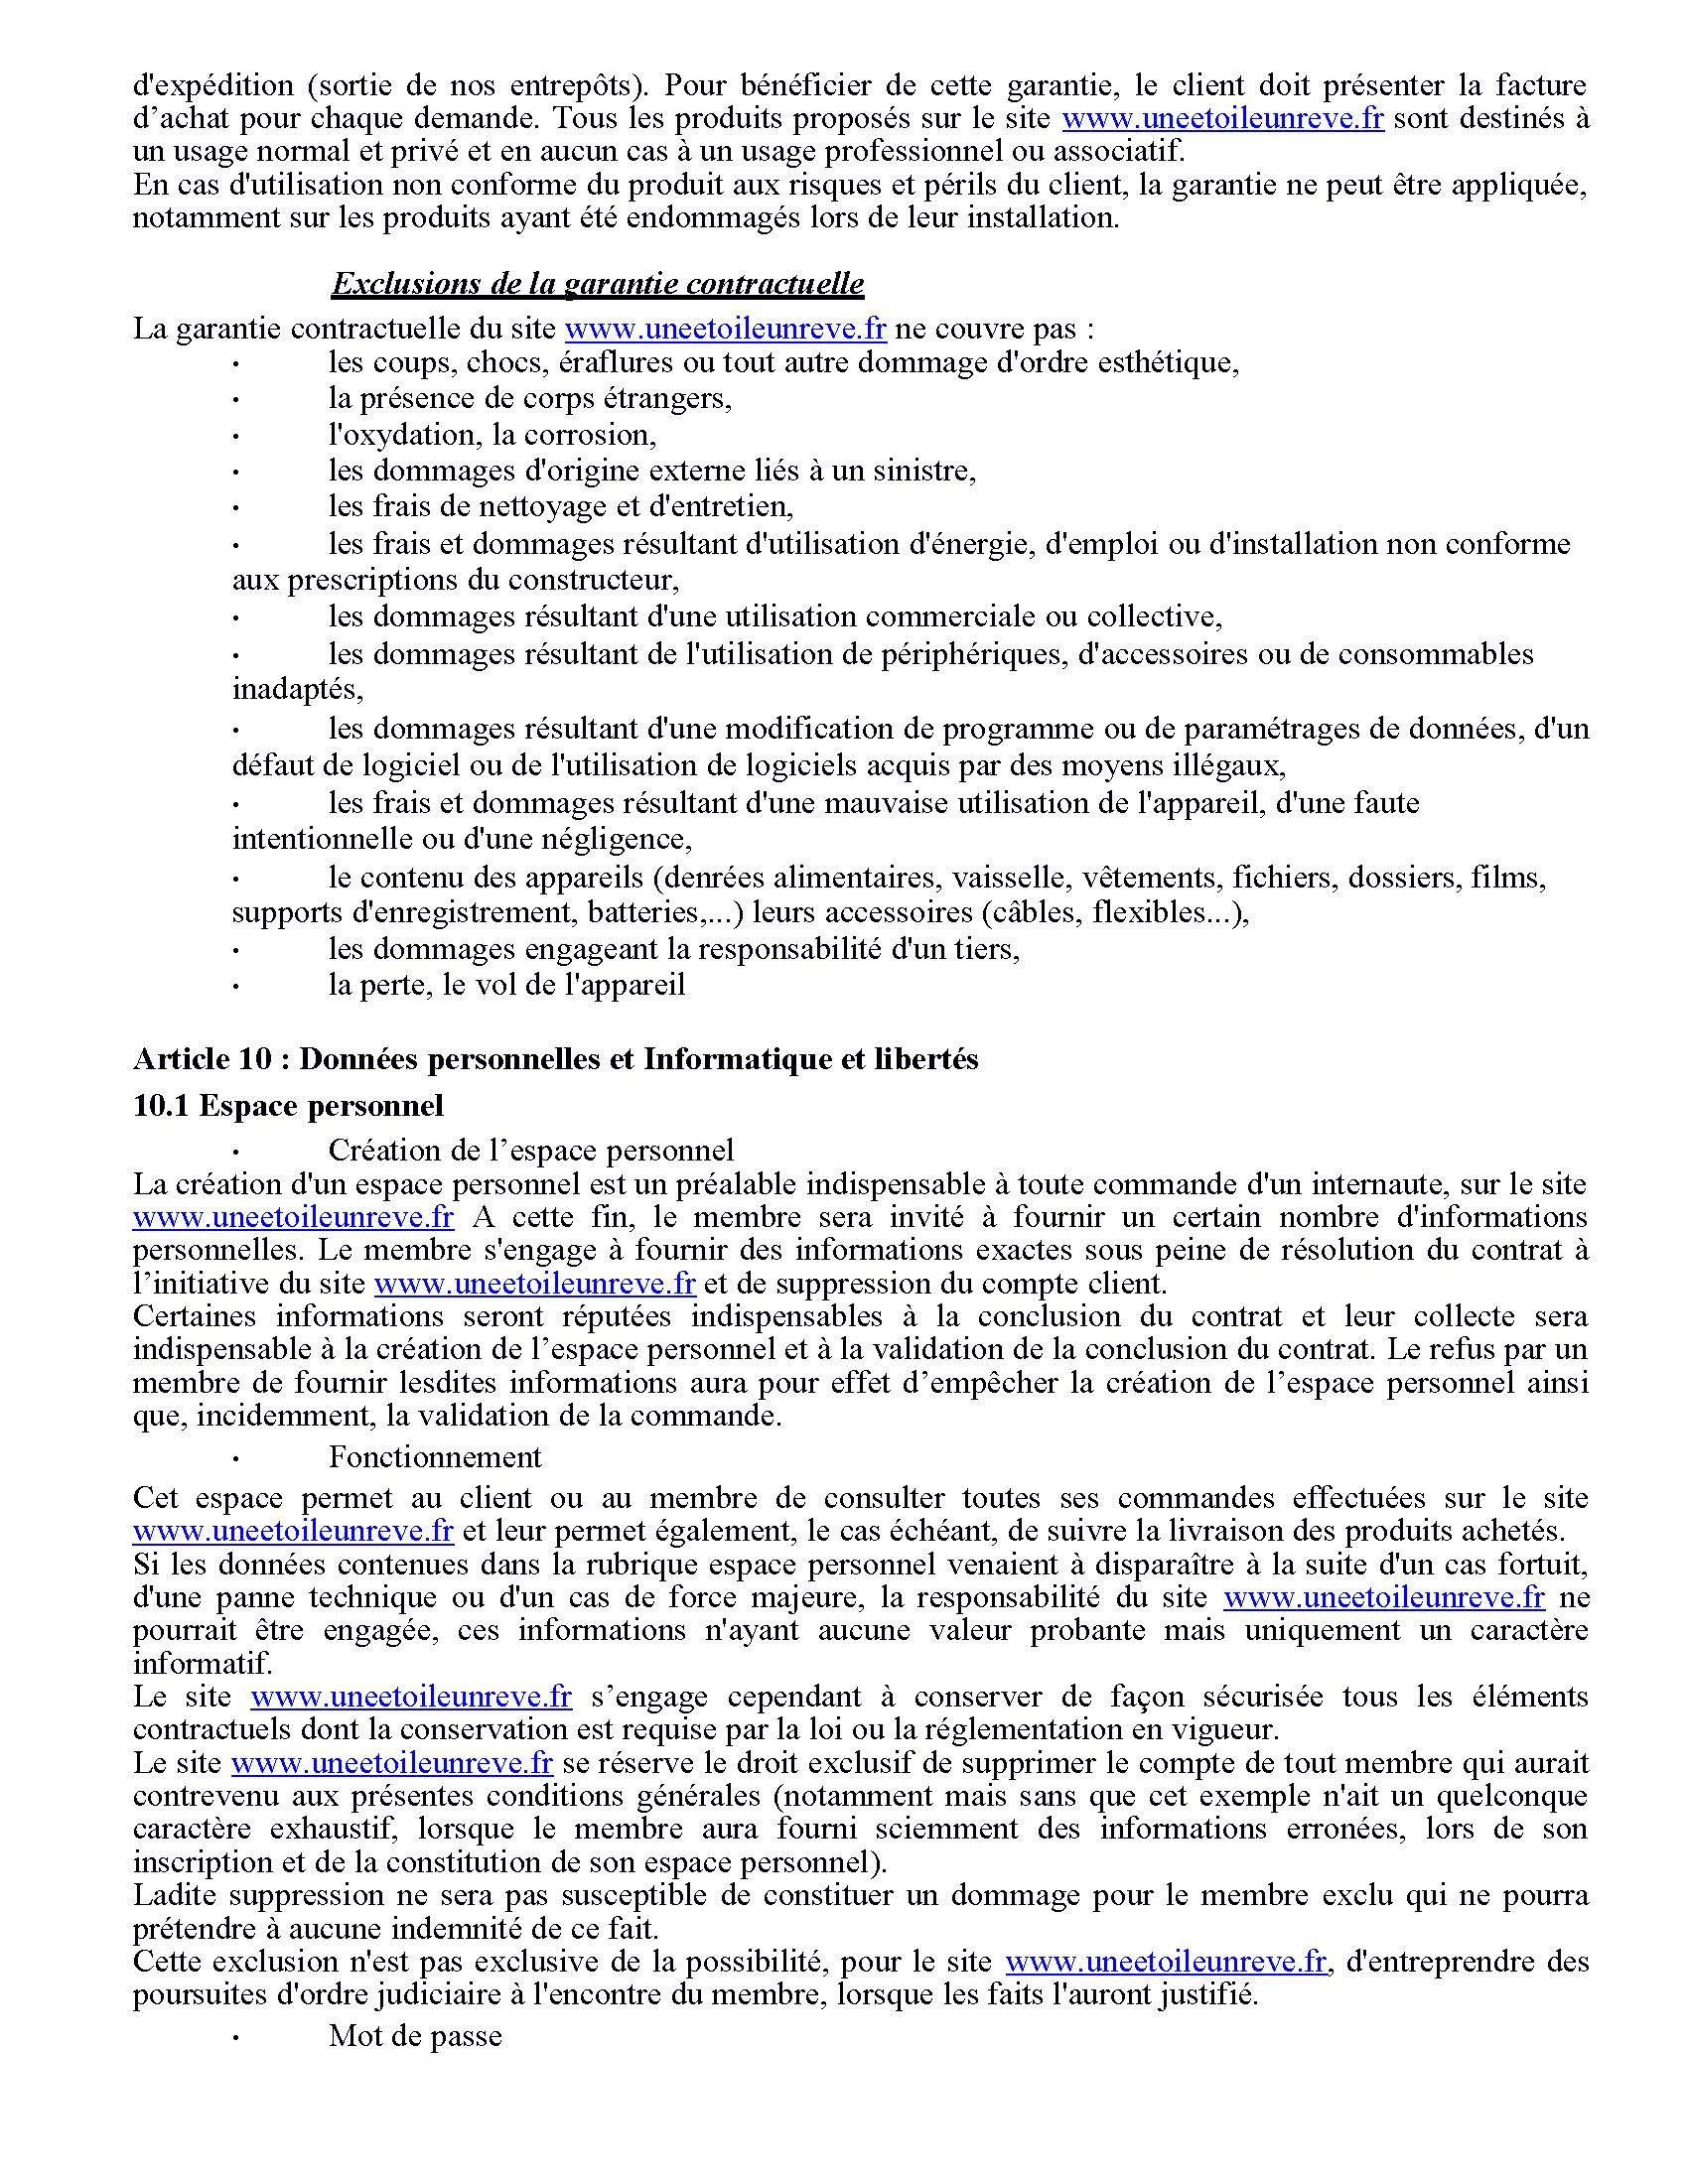 CGV_www.uneetoileunreve.fr_Page_11.jpg